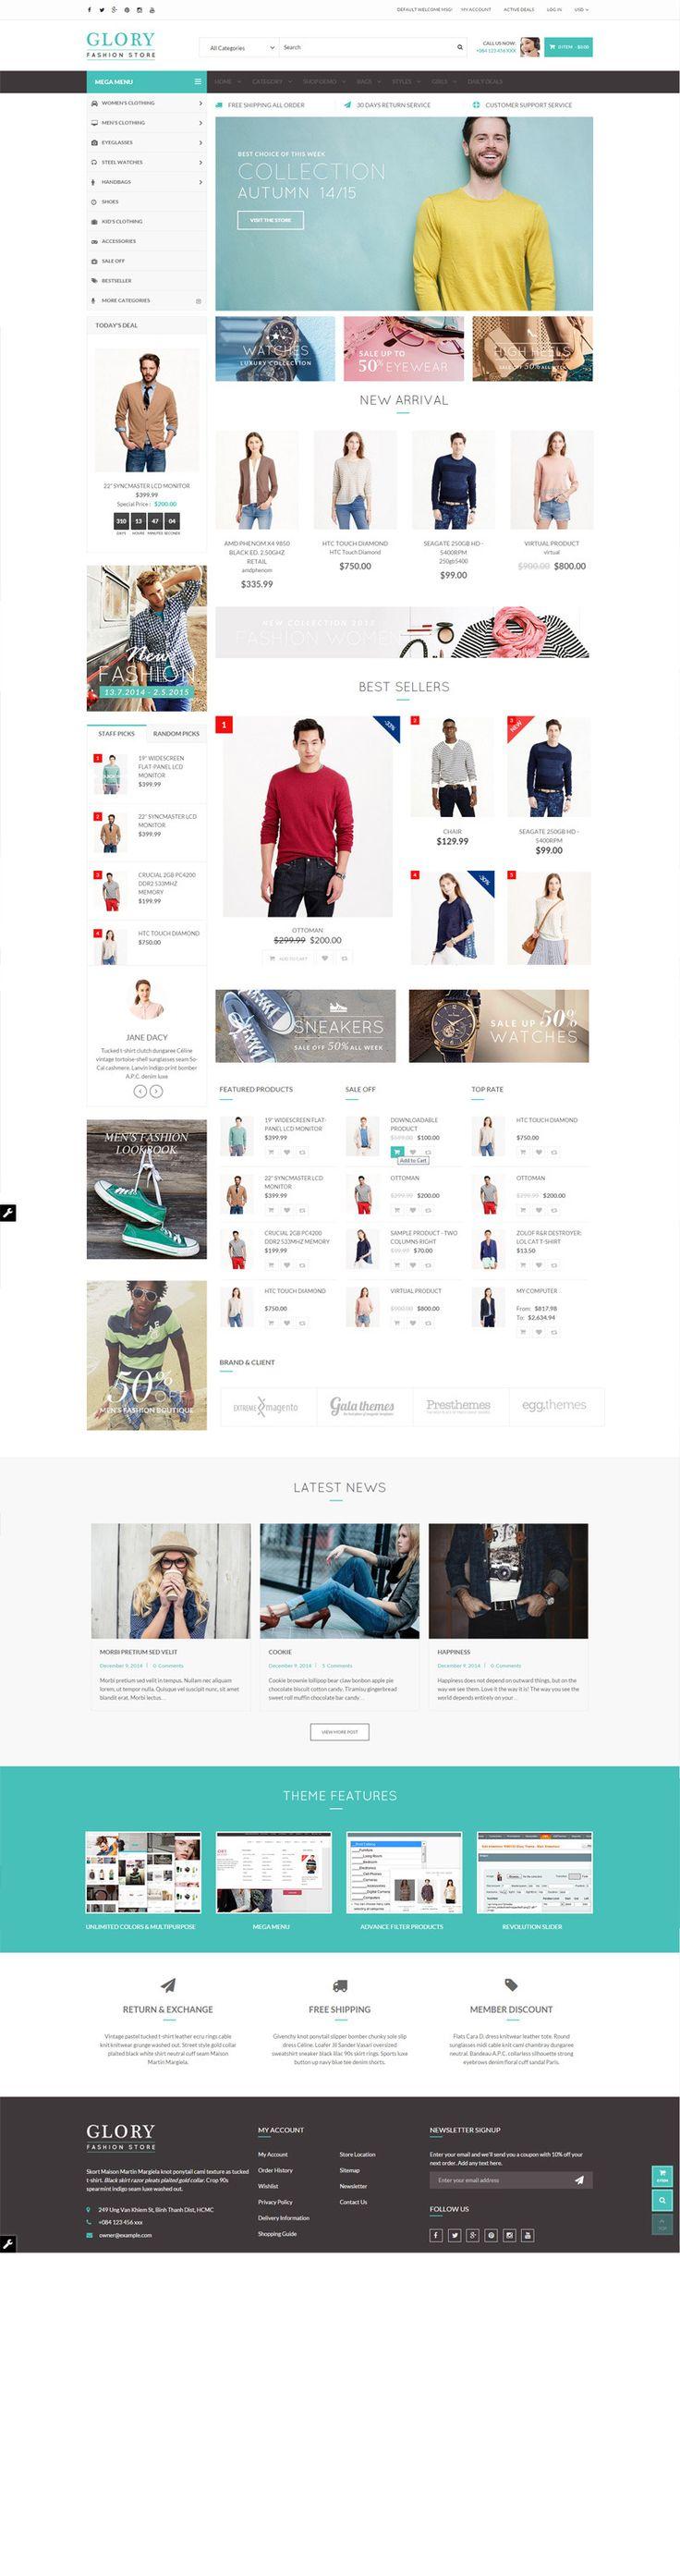 Glory - Magento Theme Multi-Styles Mobile Friendly | ThemeForest #magento #theme #template #supermarket #shoppingmall #market #ecommerce #deal